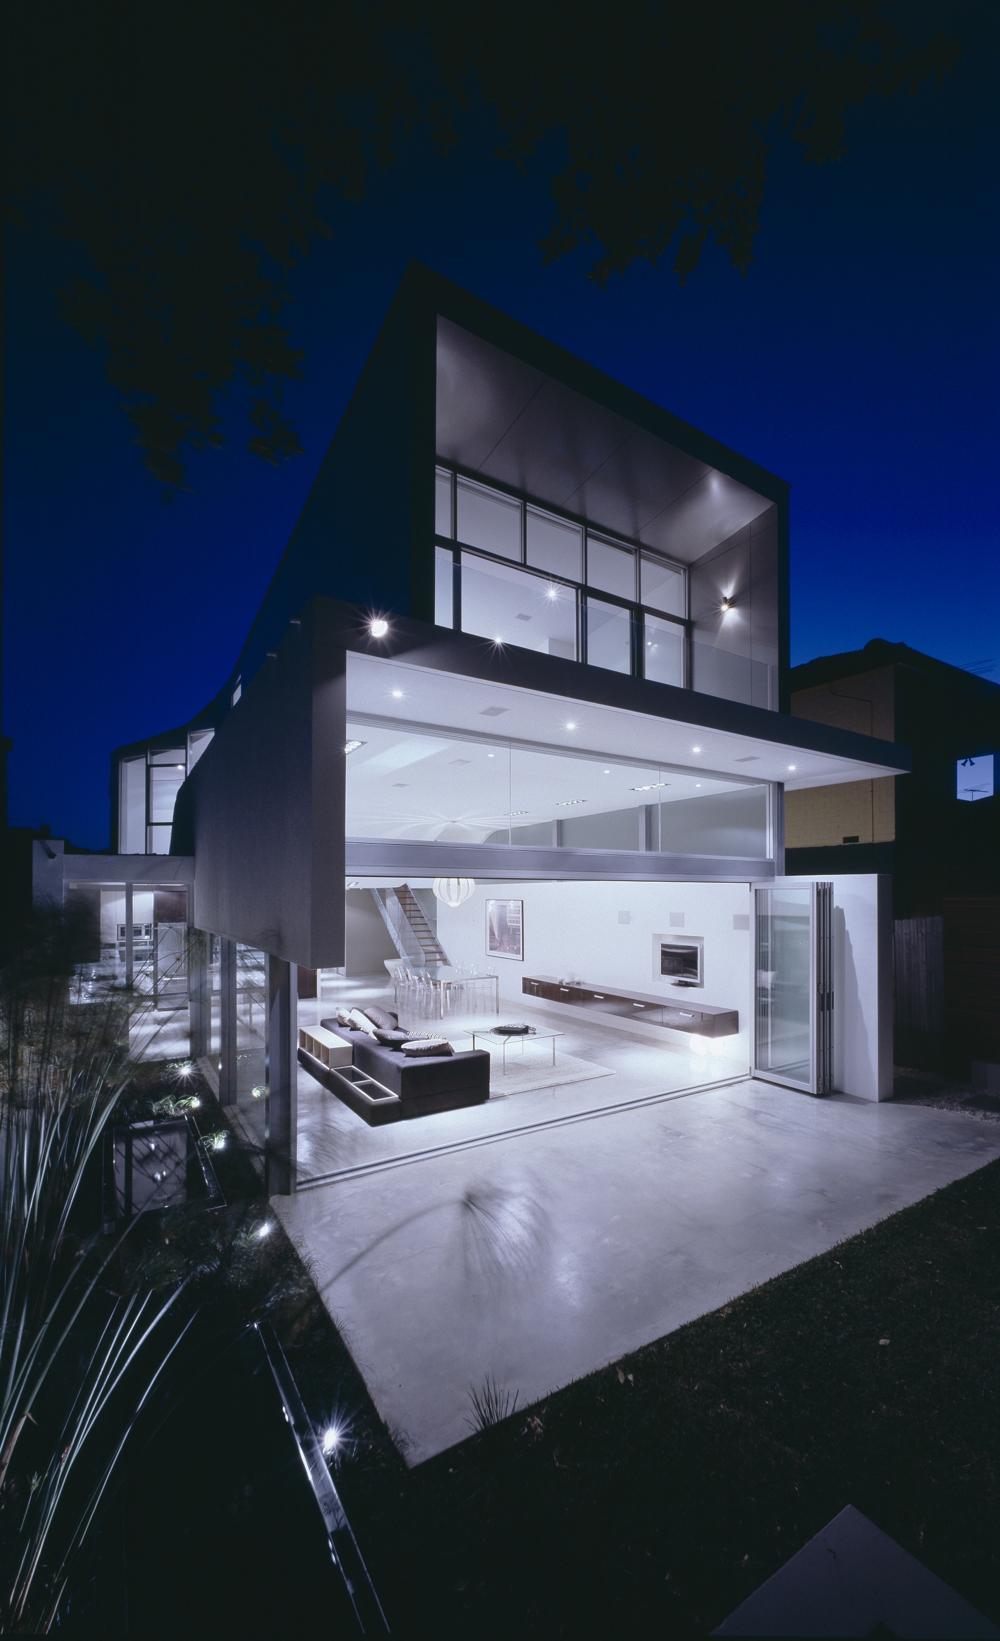 contemporary residence best minimalist home designs | Modern Minimalist Beach House - Wave House by Tony Owen ...